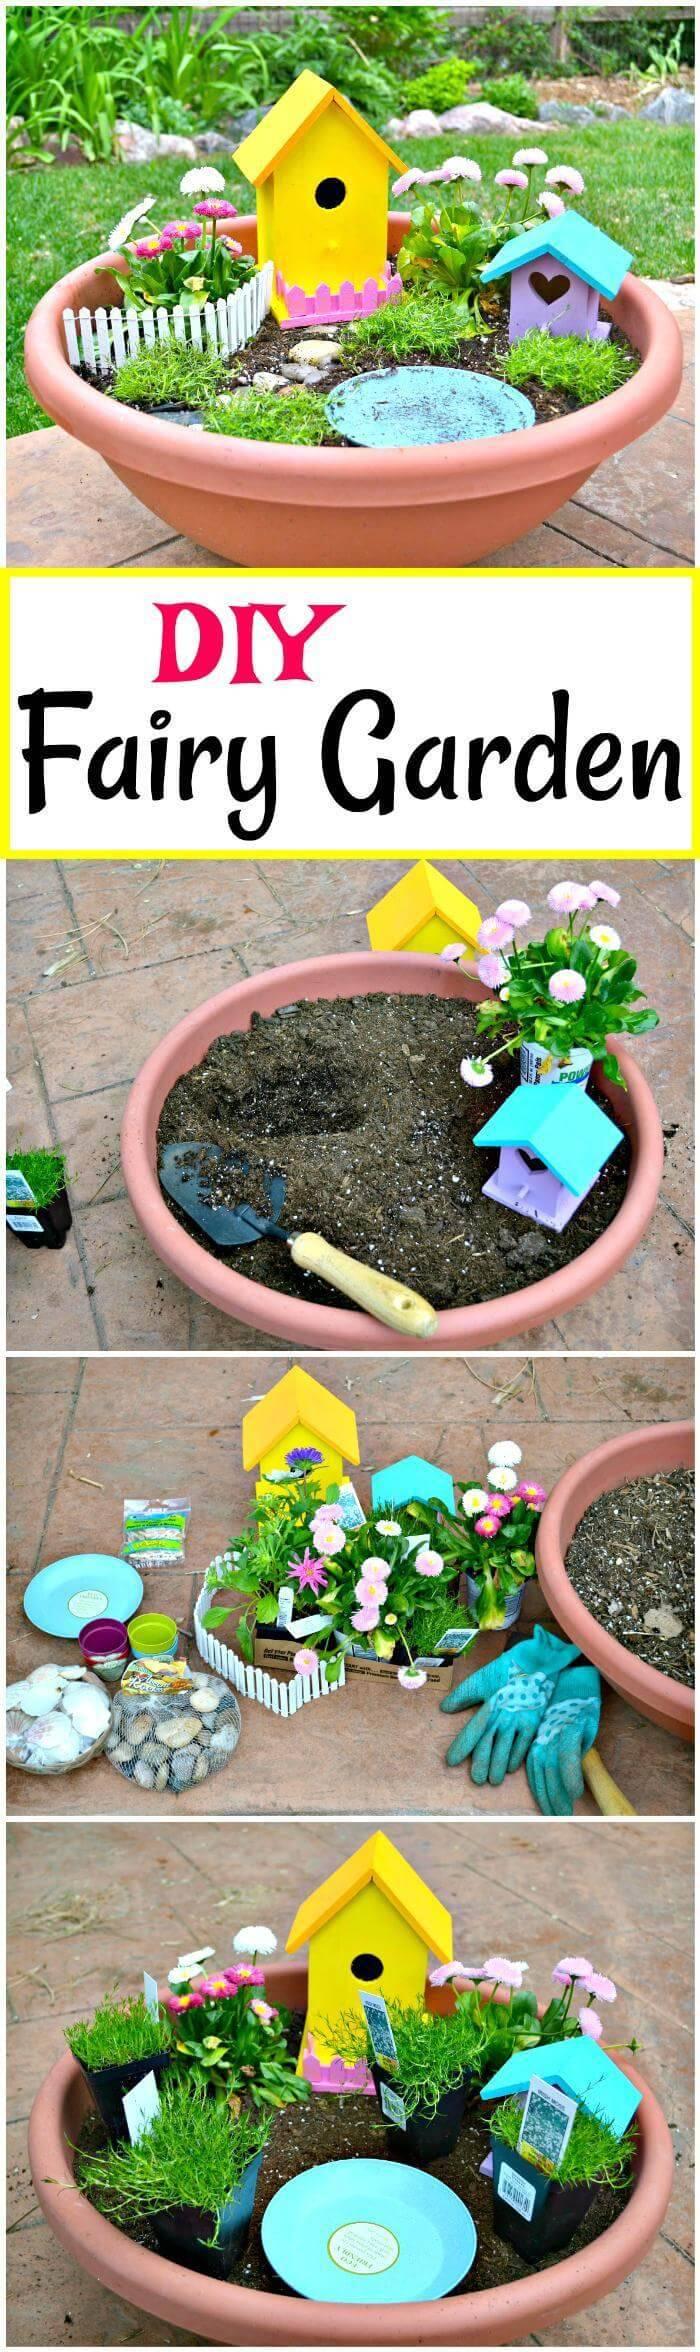 DIY Fairy Garden tutorial